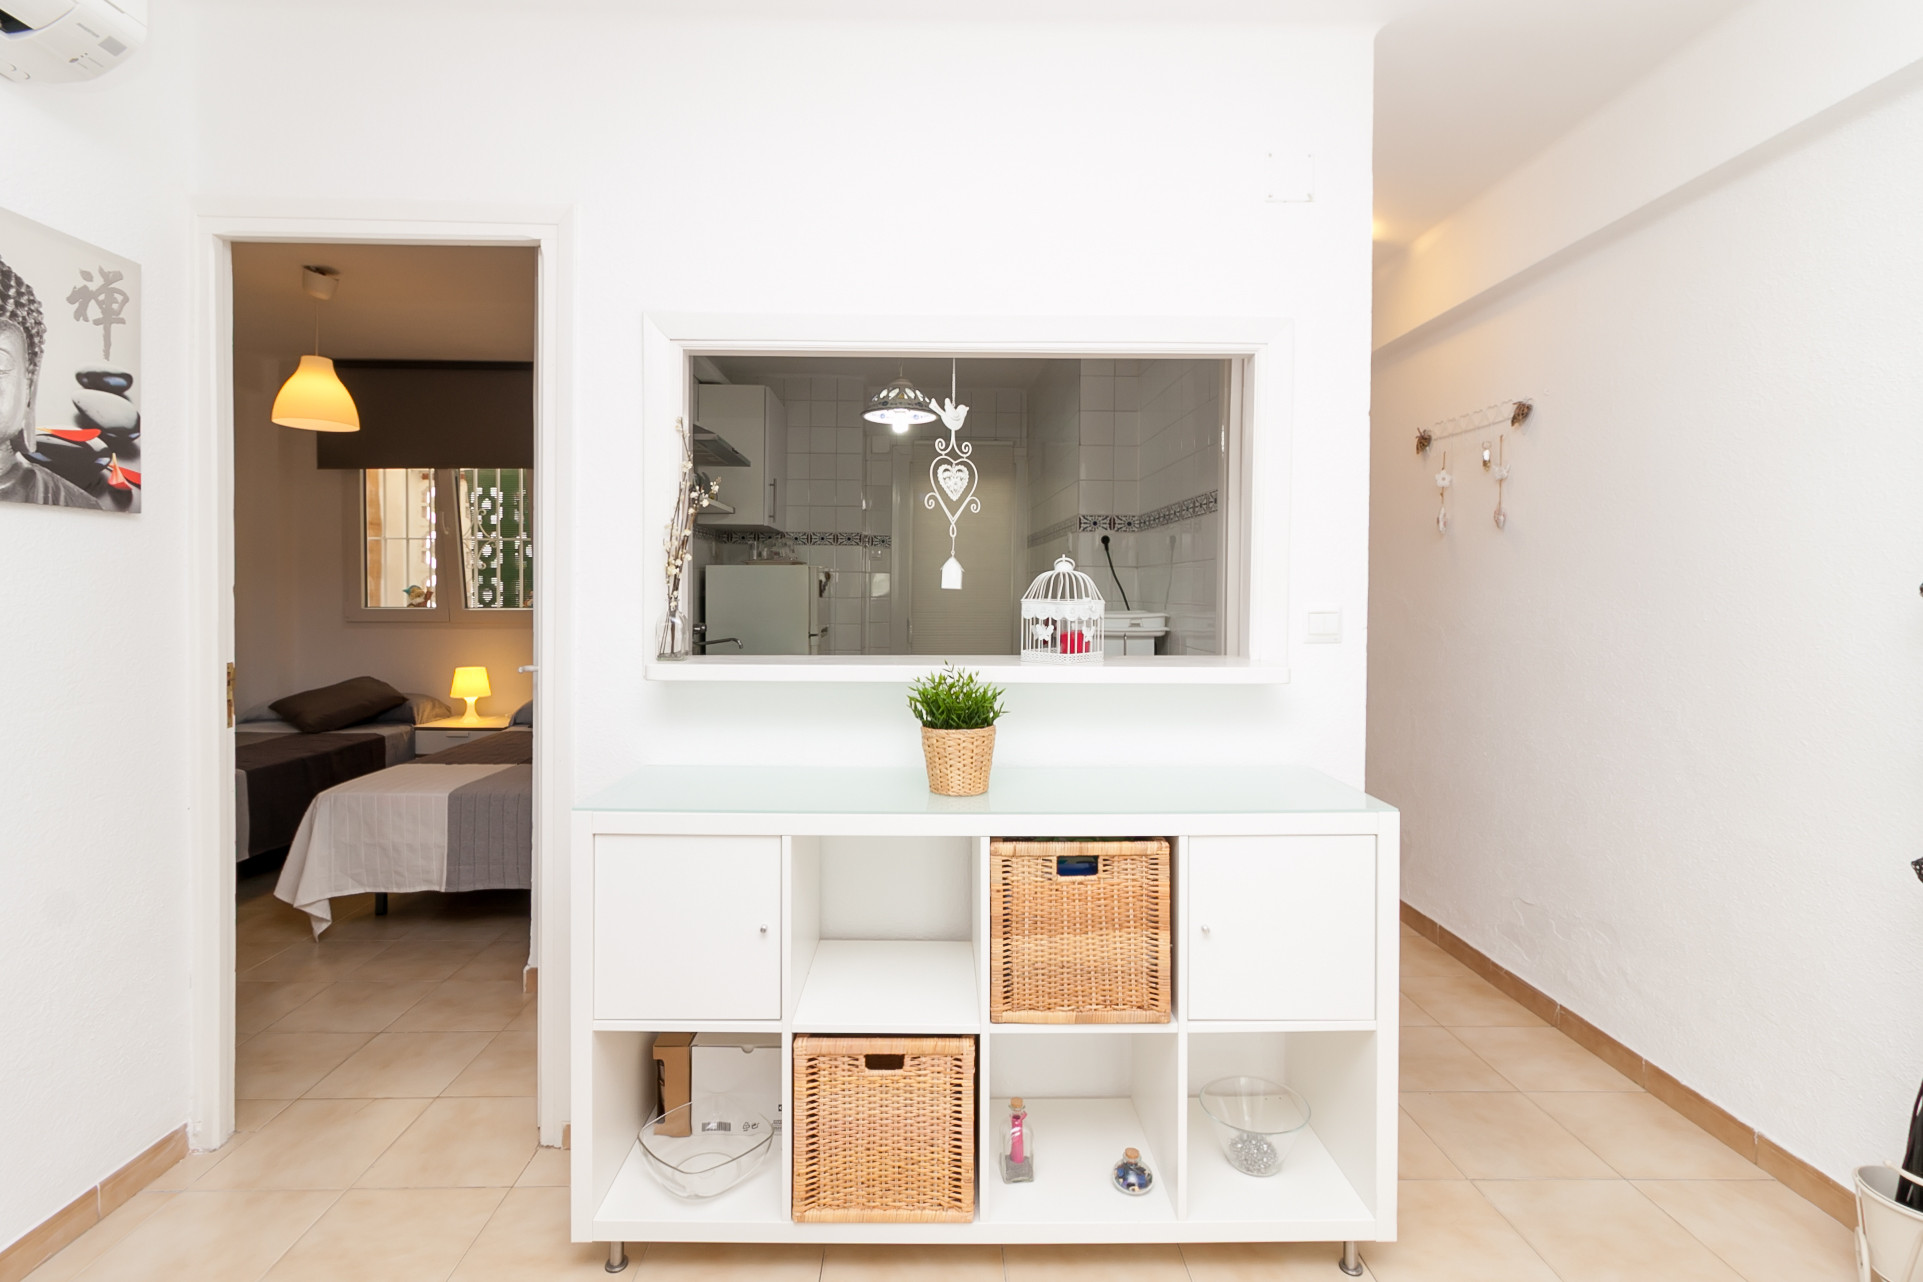 Casablanca apartment Nerja Canovas CN - Apartments in Nerja